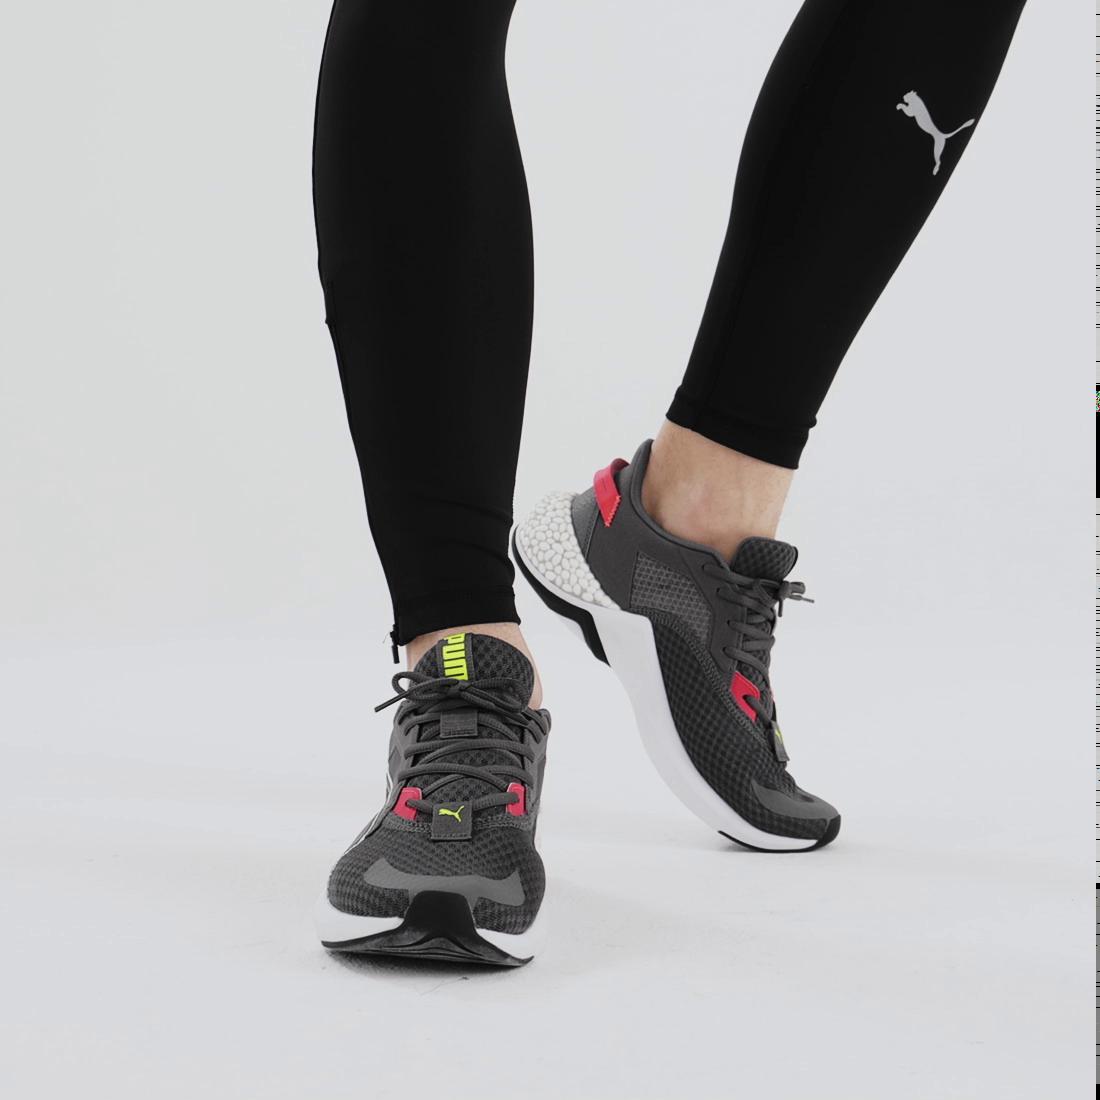 Image PUMA HYBRID NX Ozone Men's Running Shoes #8